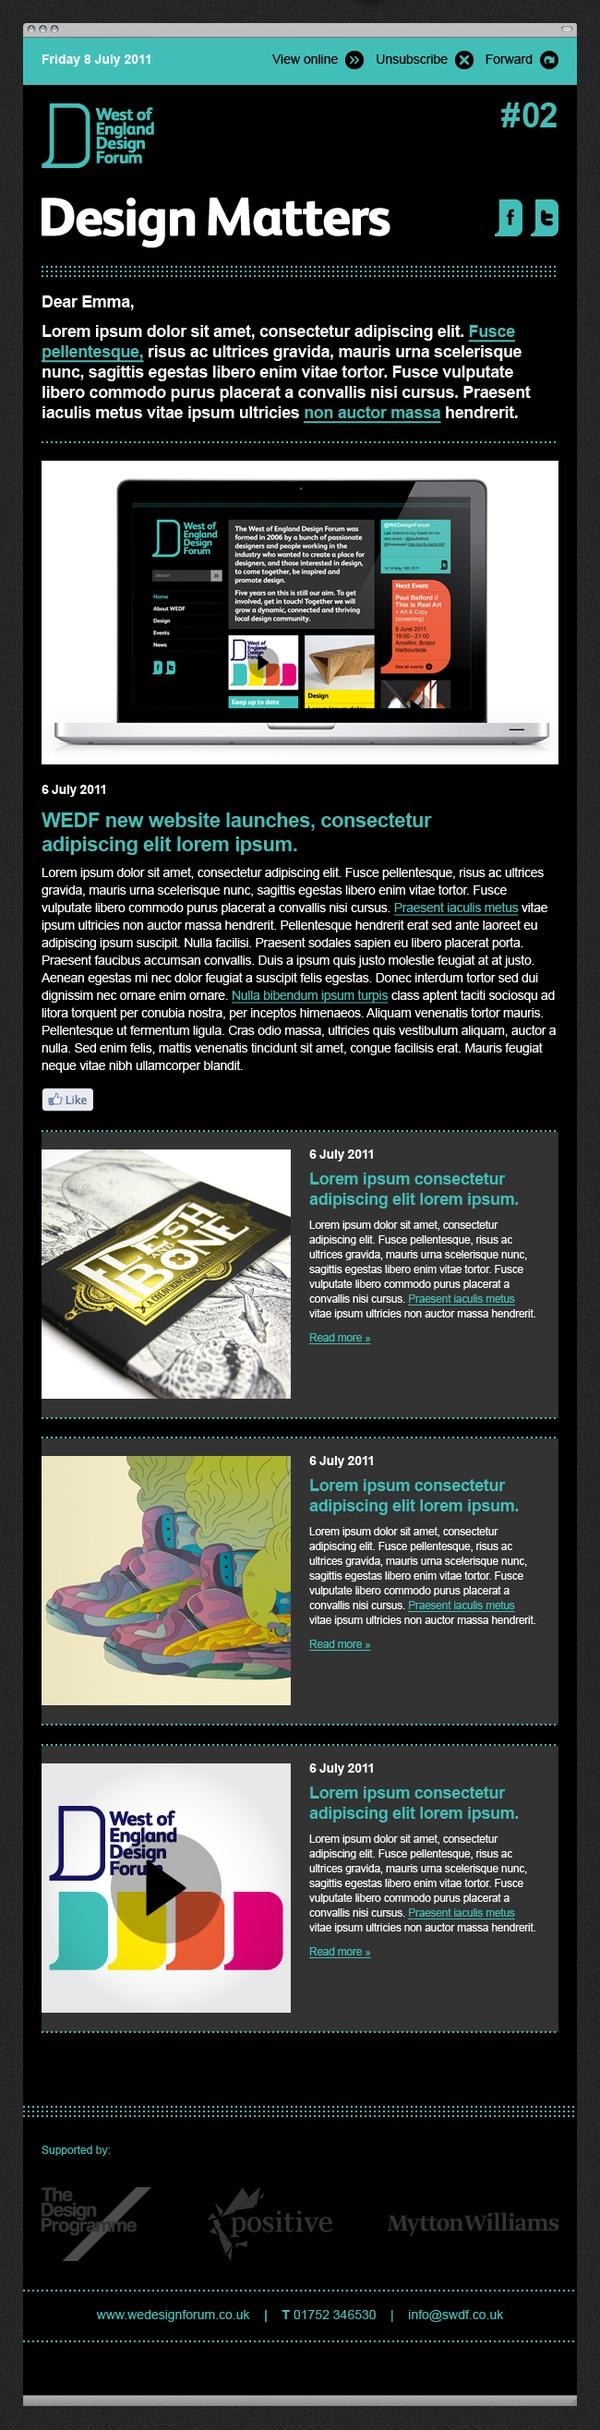 8 best Email design images on Pinterest | Email design, Email ...